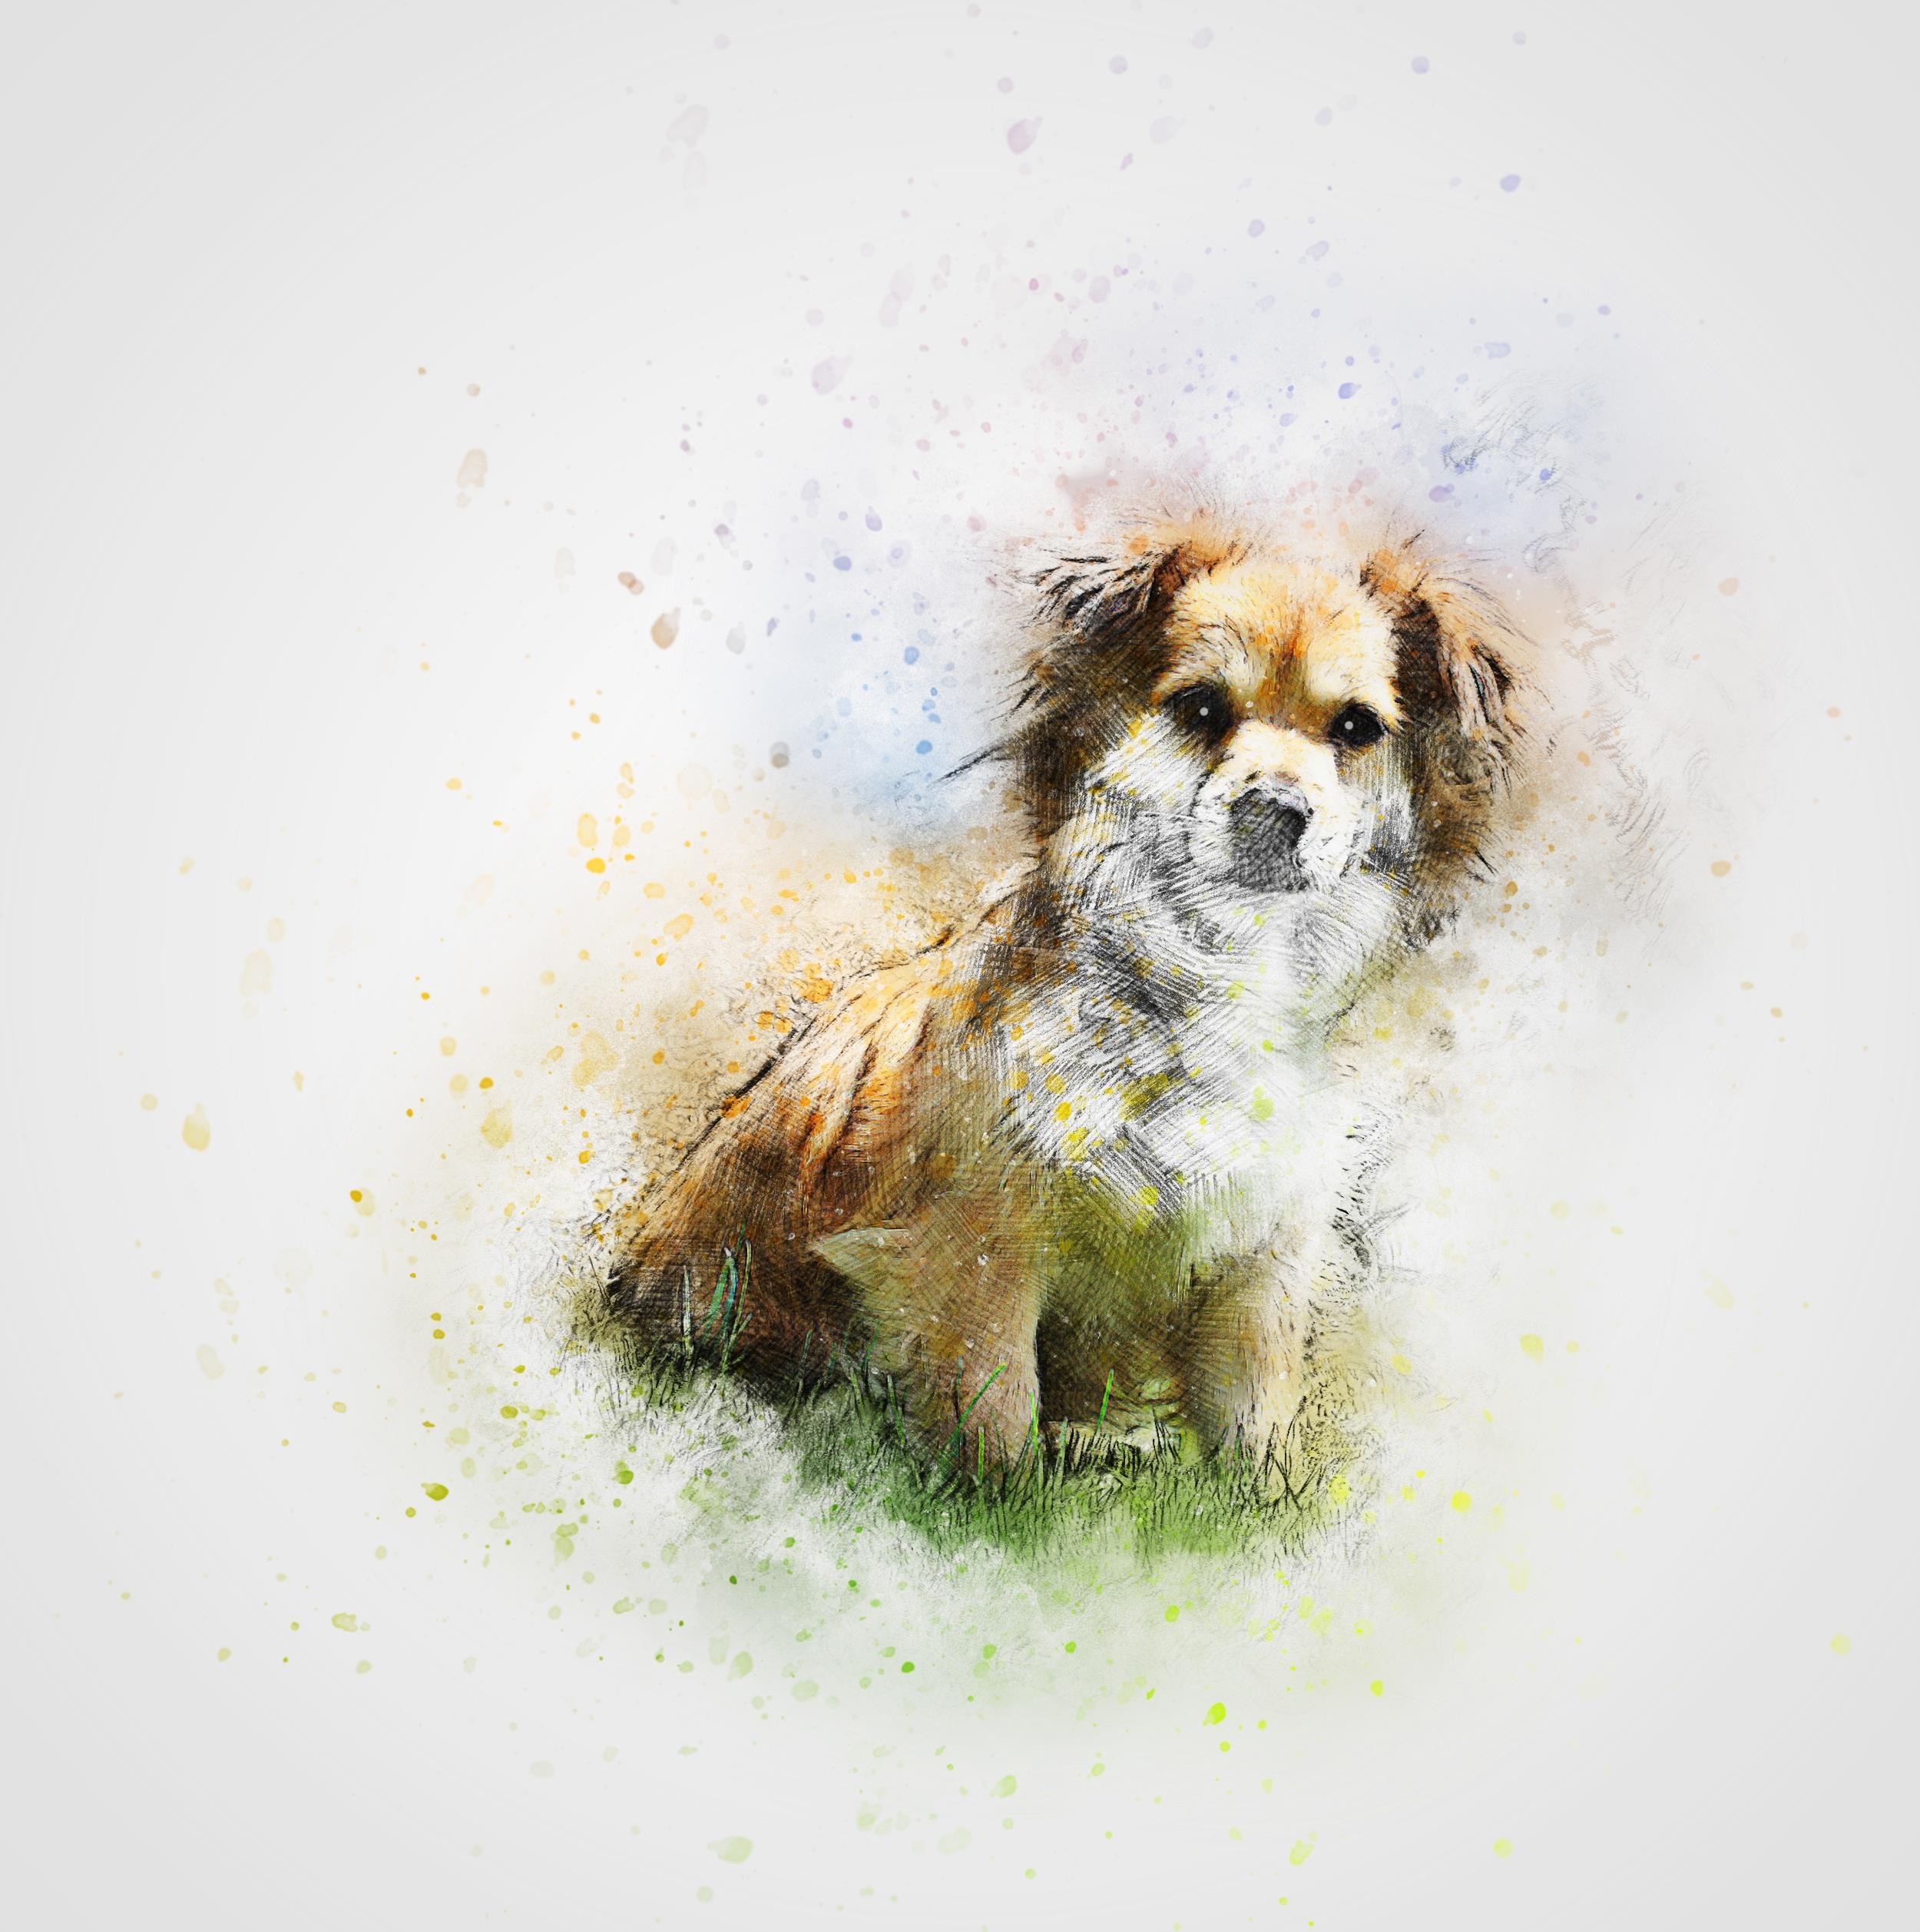 Grass Abstract Vintage Puppy Dog Cute Pet Mammal Art Illustration Design Vertebrate Breed Lhasa Apso